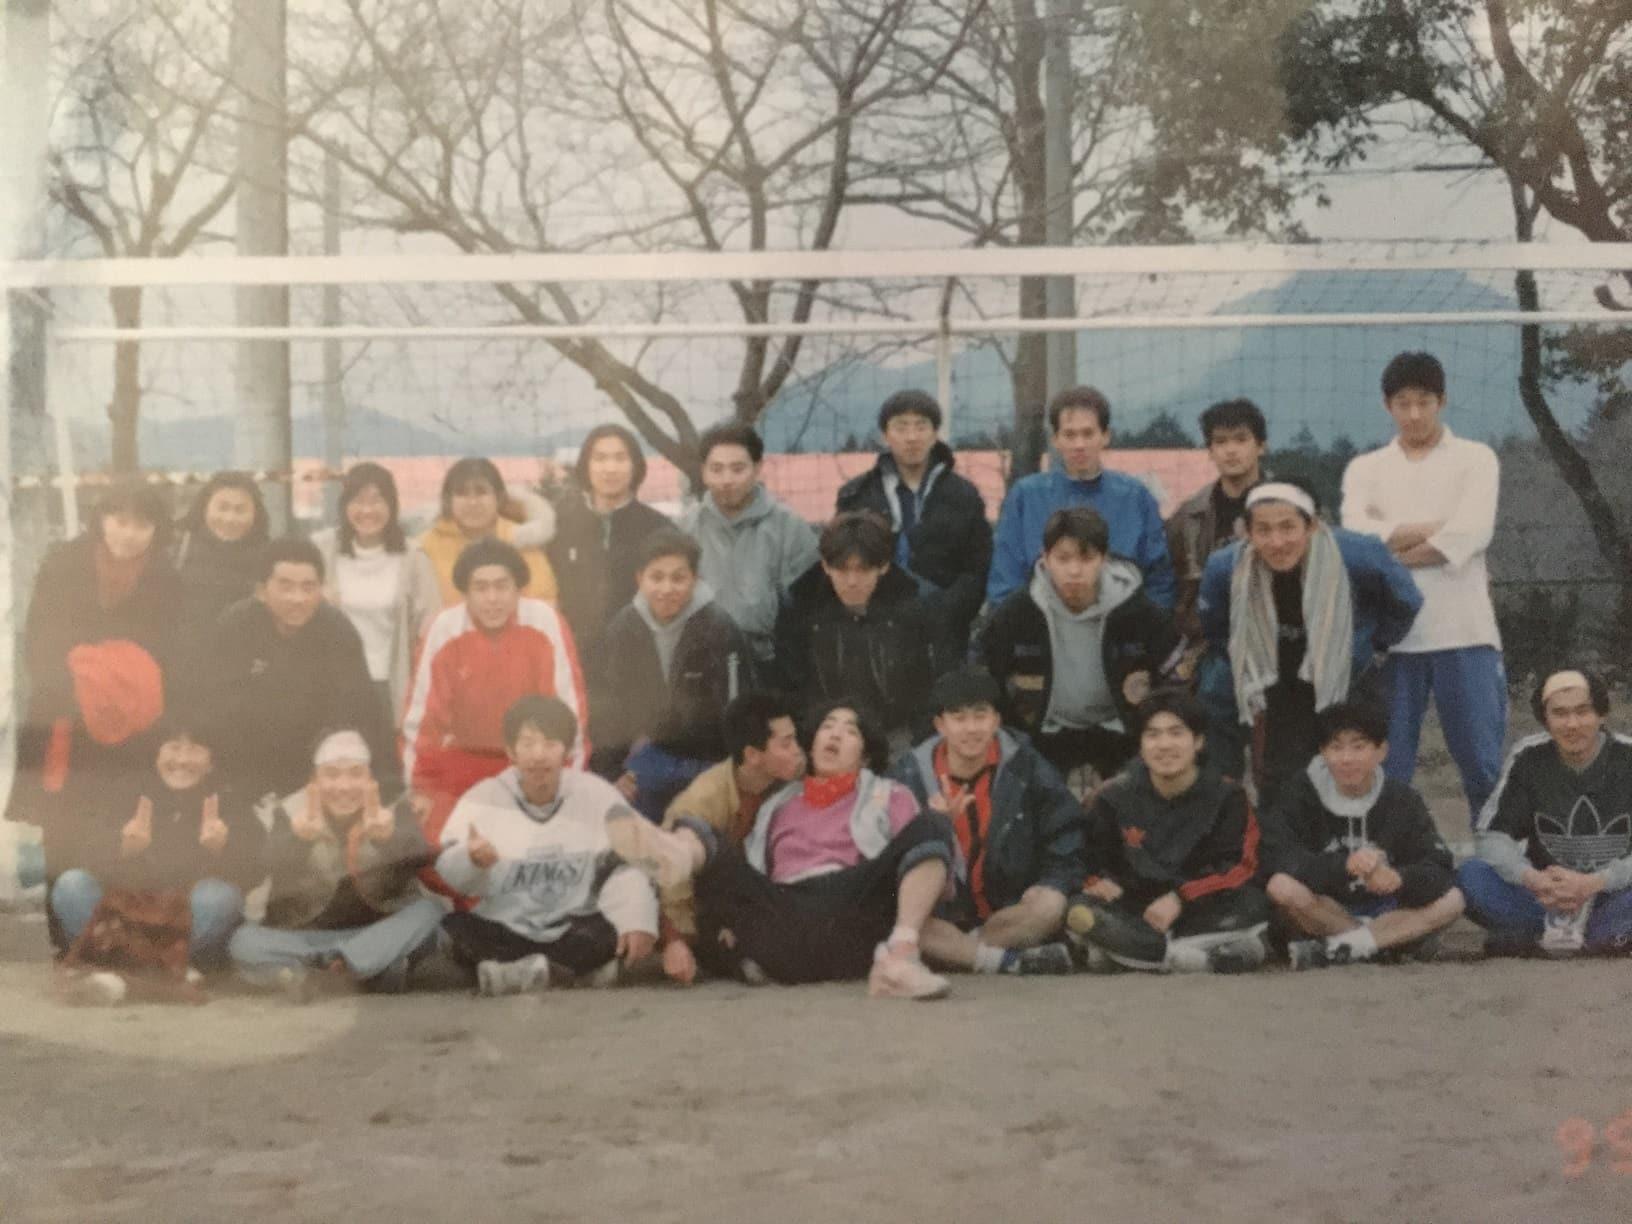 b62f482186 その昔、早いもので今から約30年前、宇都宮市内の高校を卒業し進学した先は、静岡県富士宮市にある日本建築専門学校でした 。北海道から沖縄まで、全寮制で4年間。